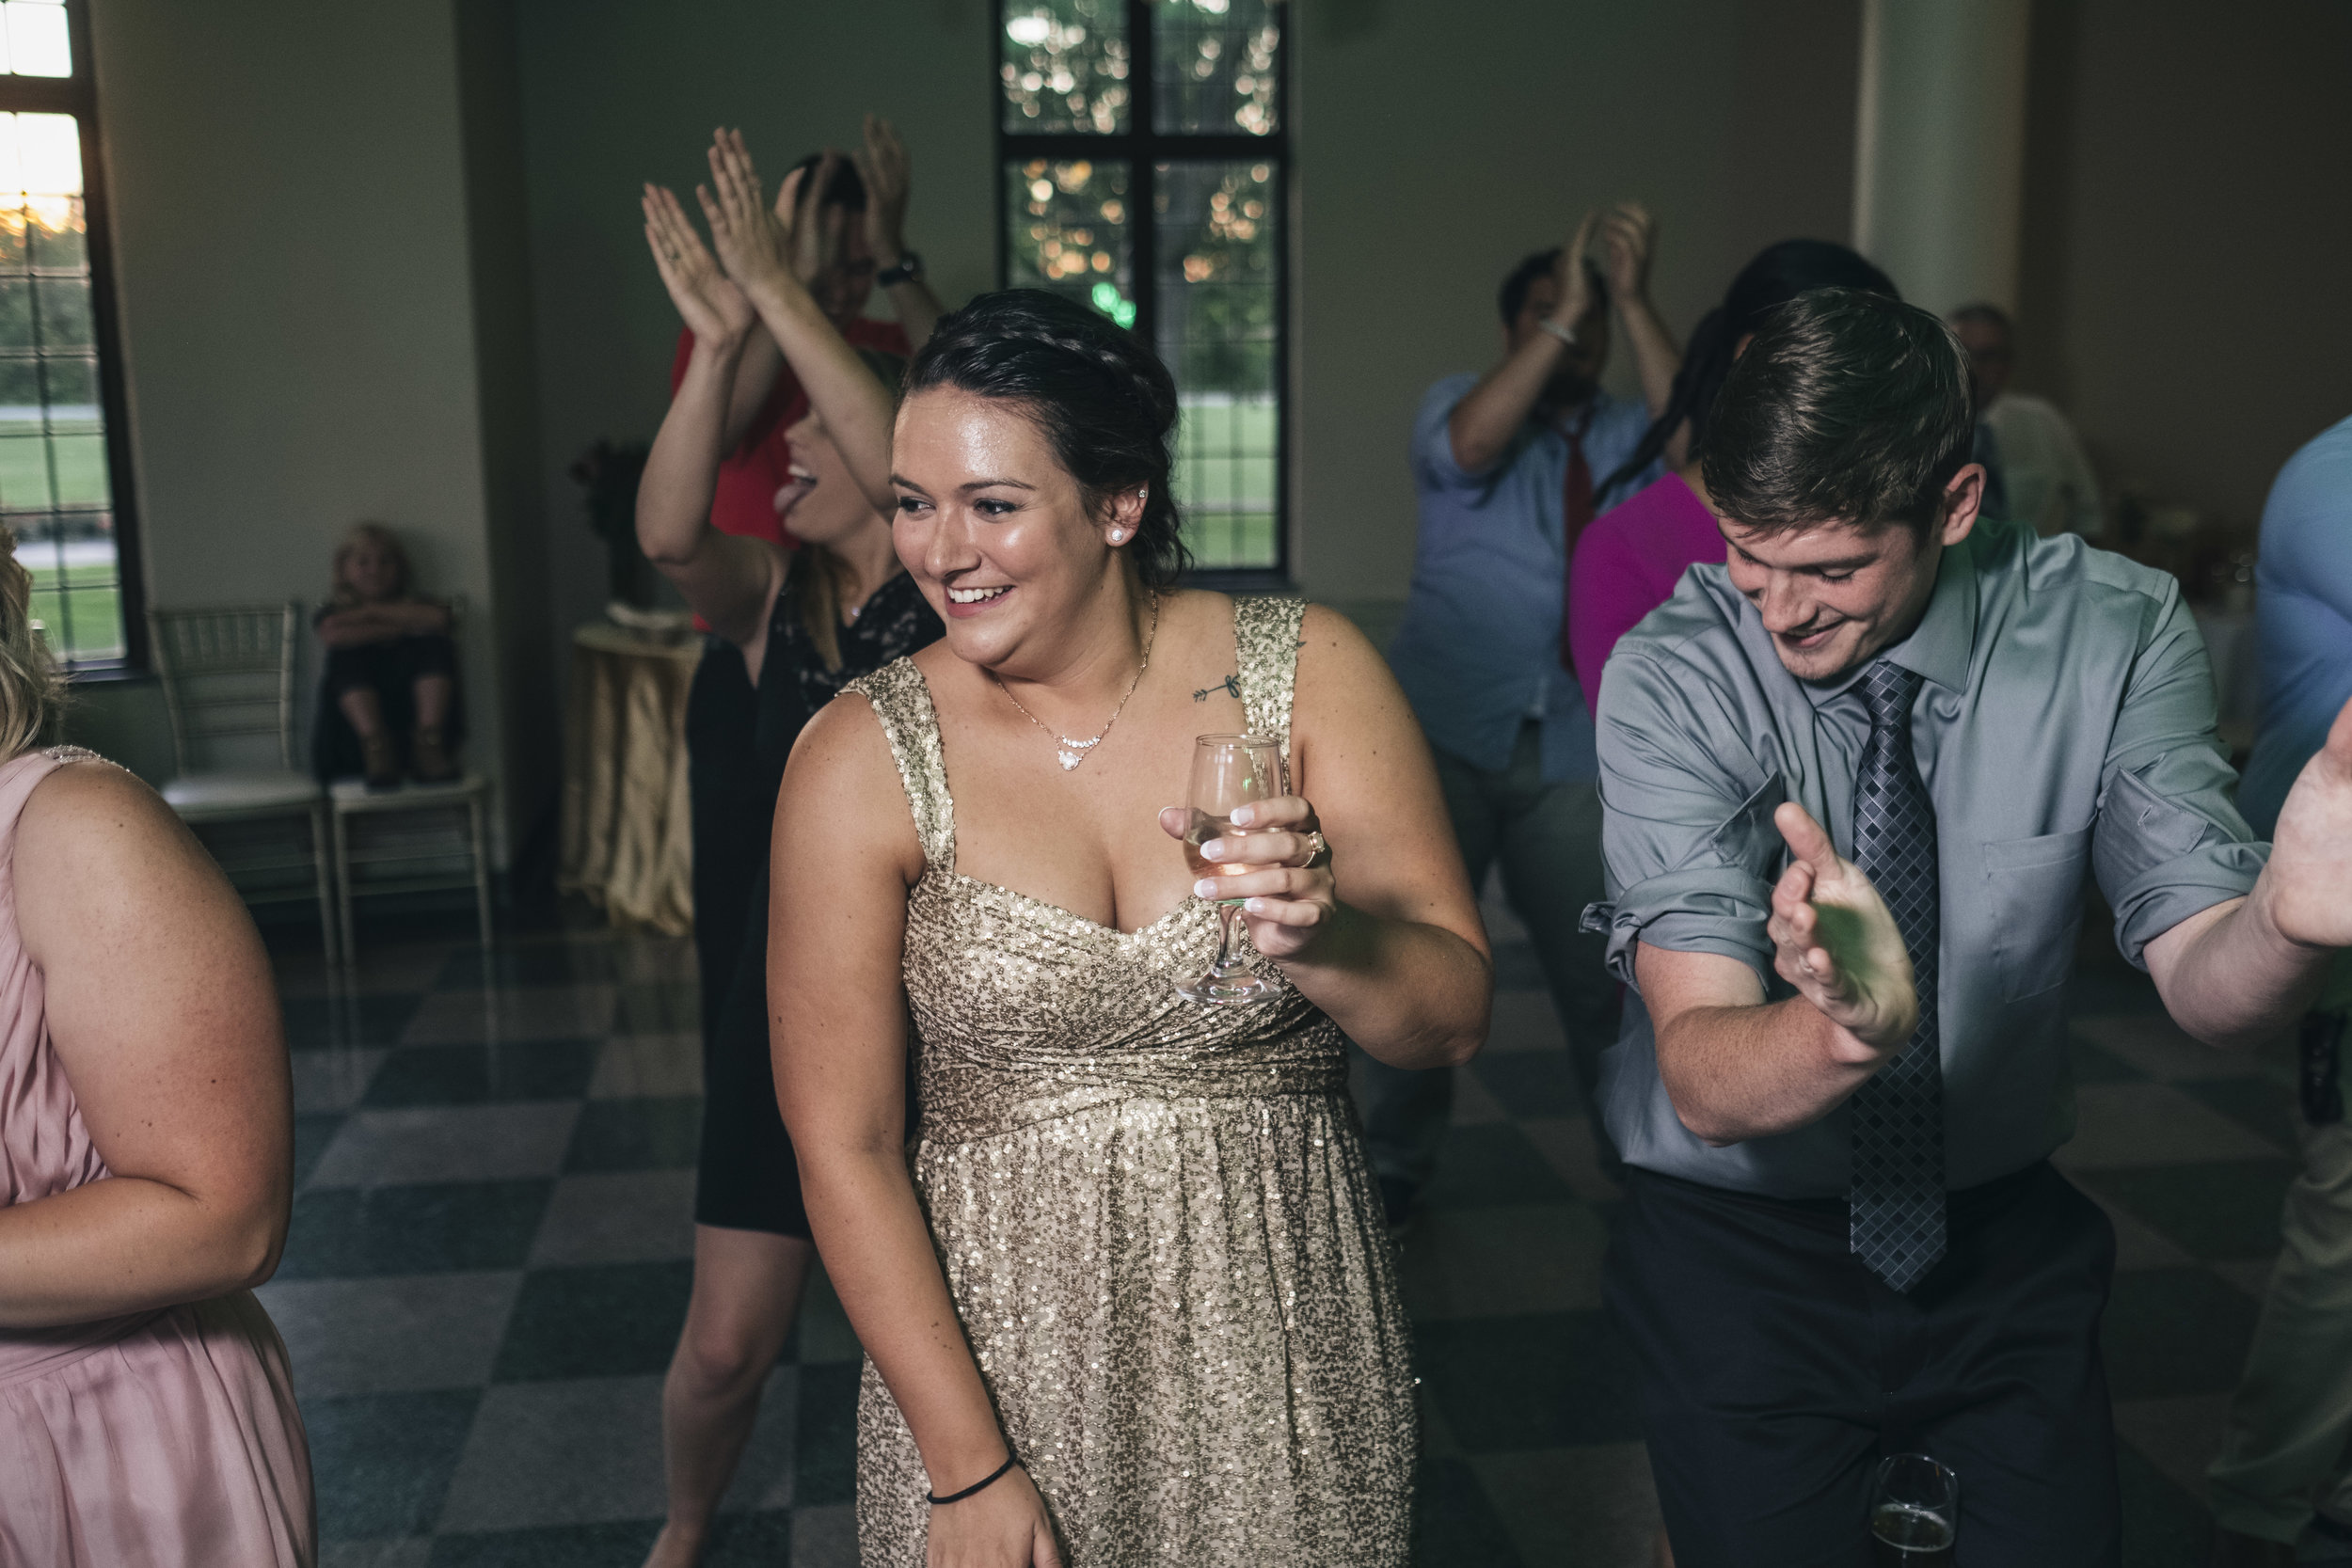 Bridesmaid dances at a wedding reception in Northwest, Ohio.